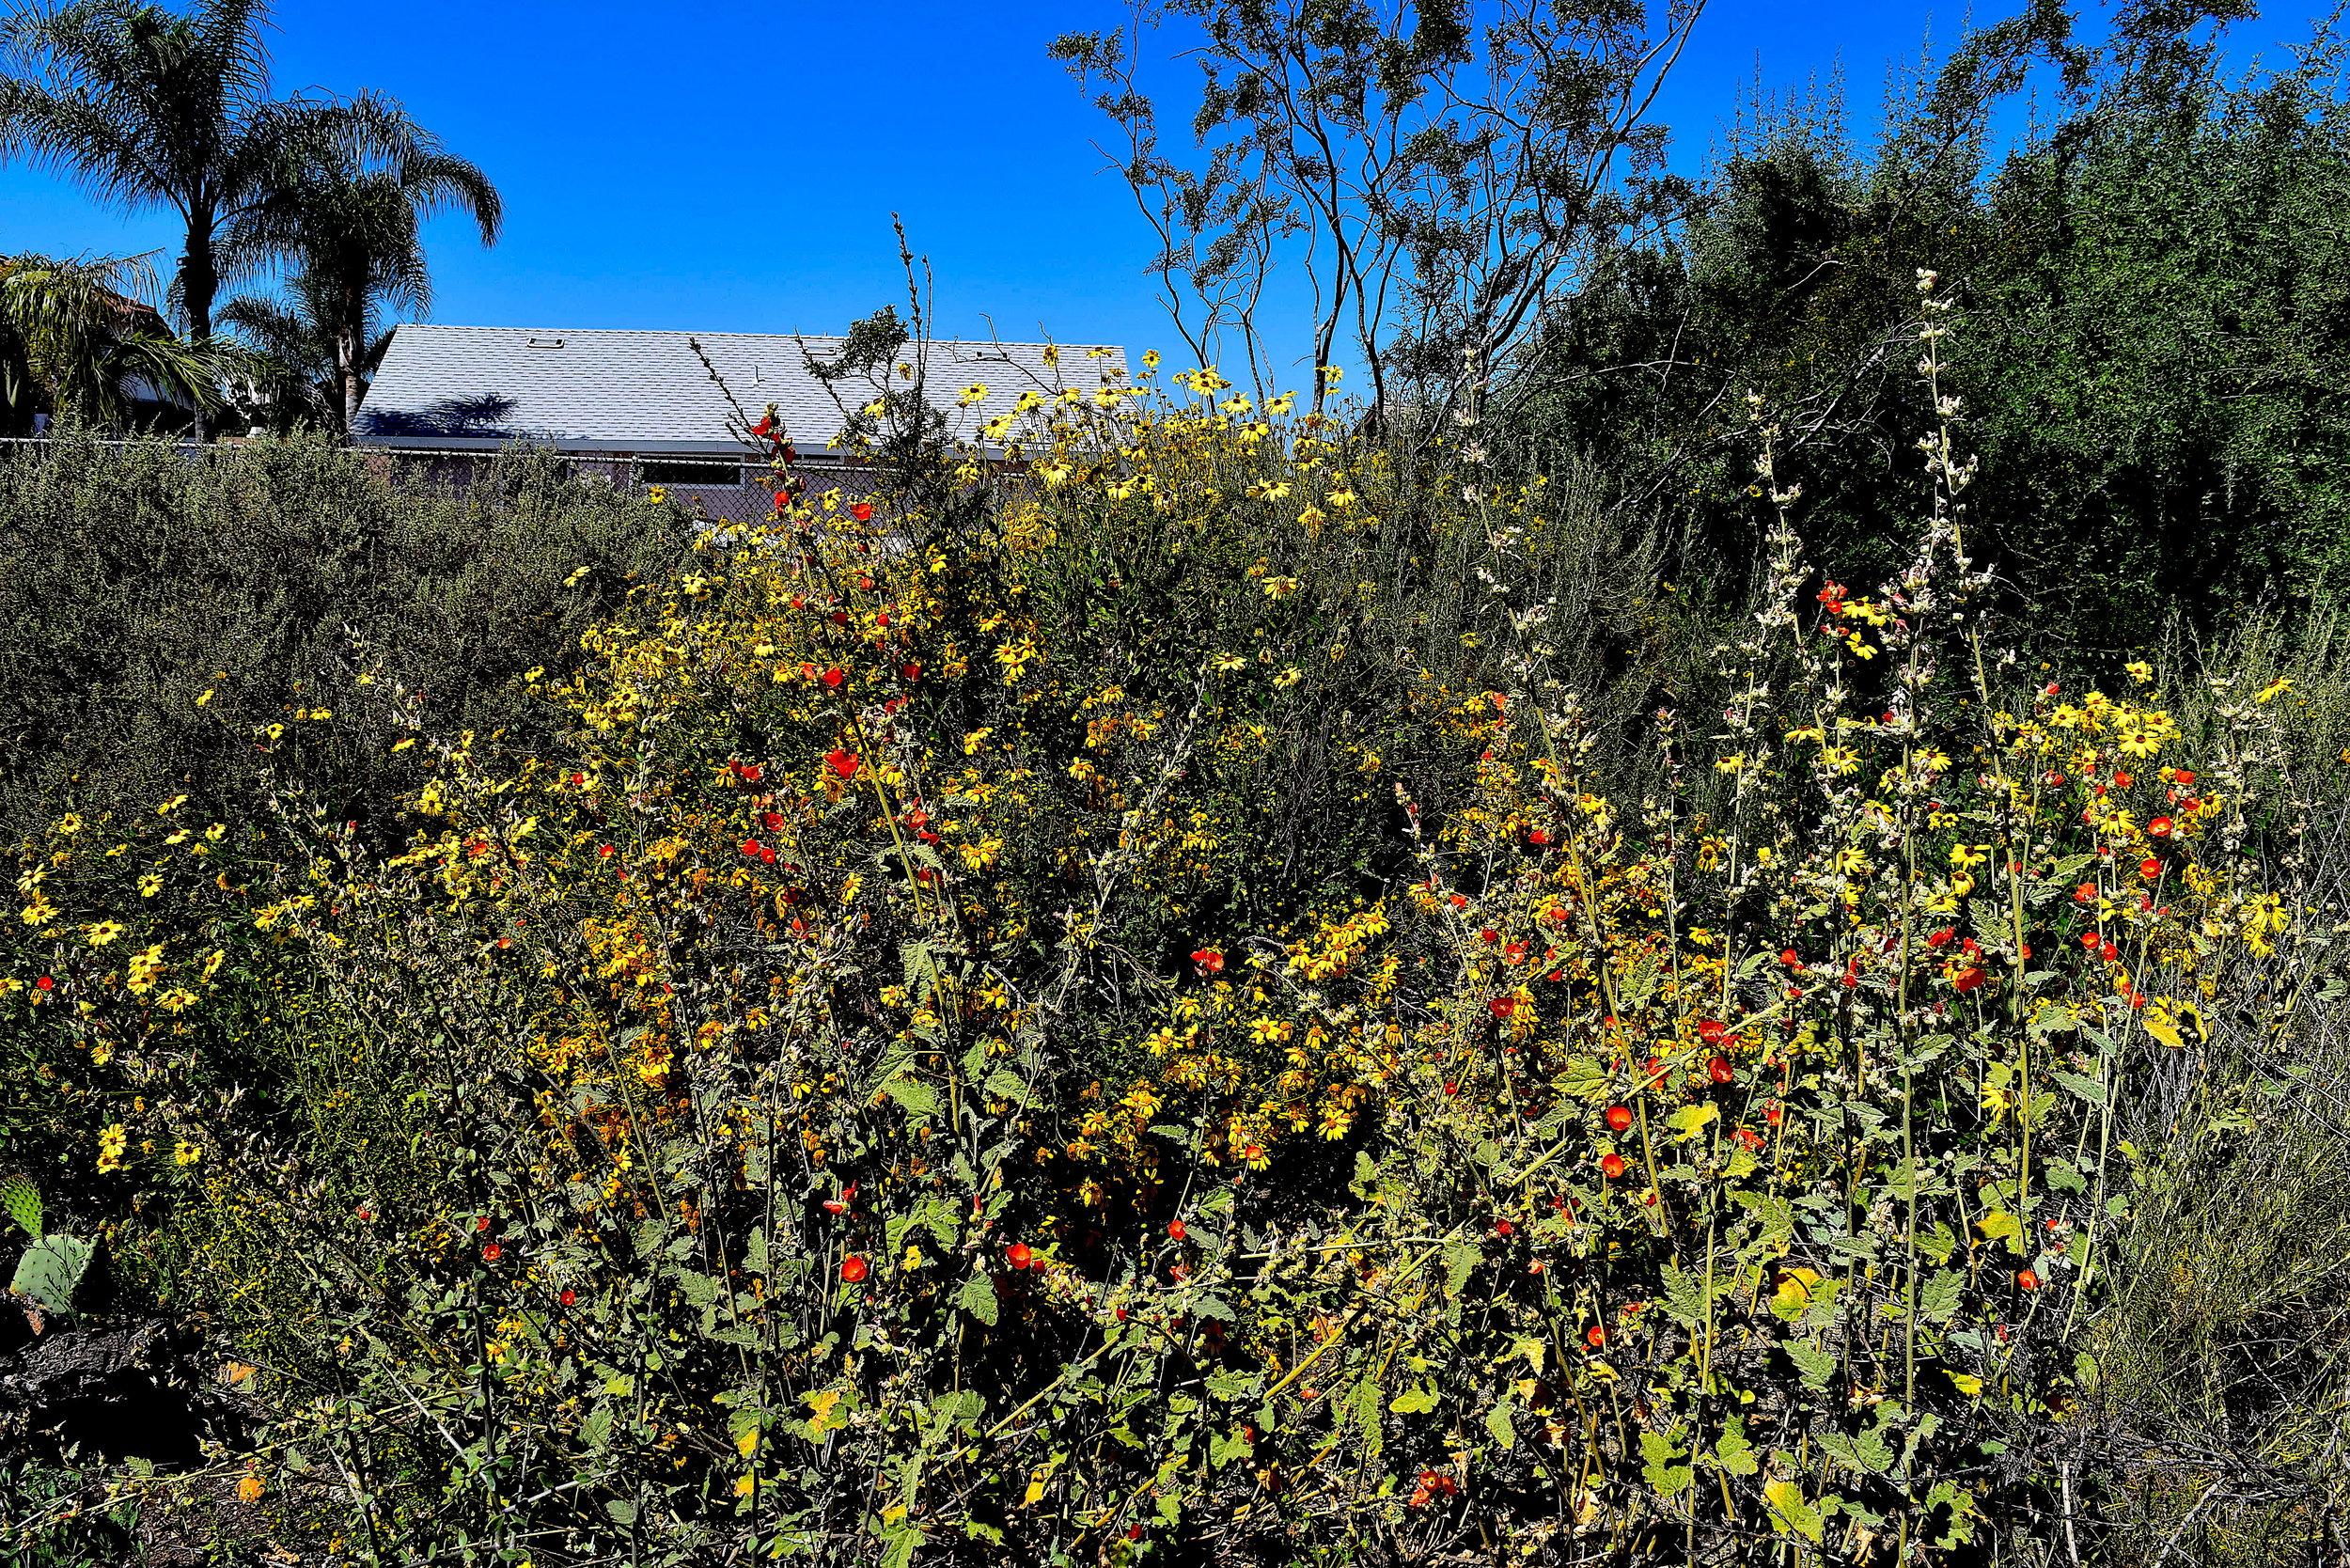 Encelia californica and Spharaelcea ambigua at 'A Walk in Beauty' GNT 2017 Chris Hendrickson.JPG